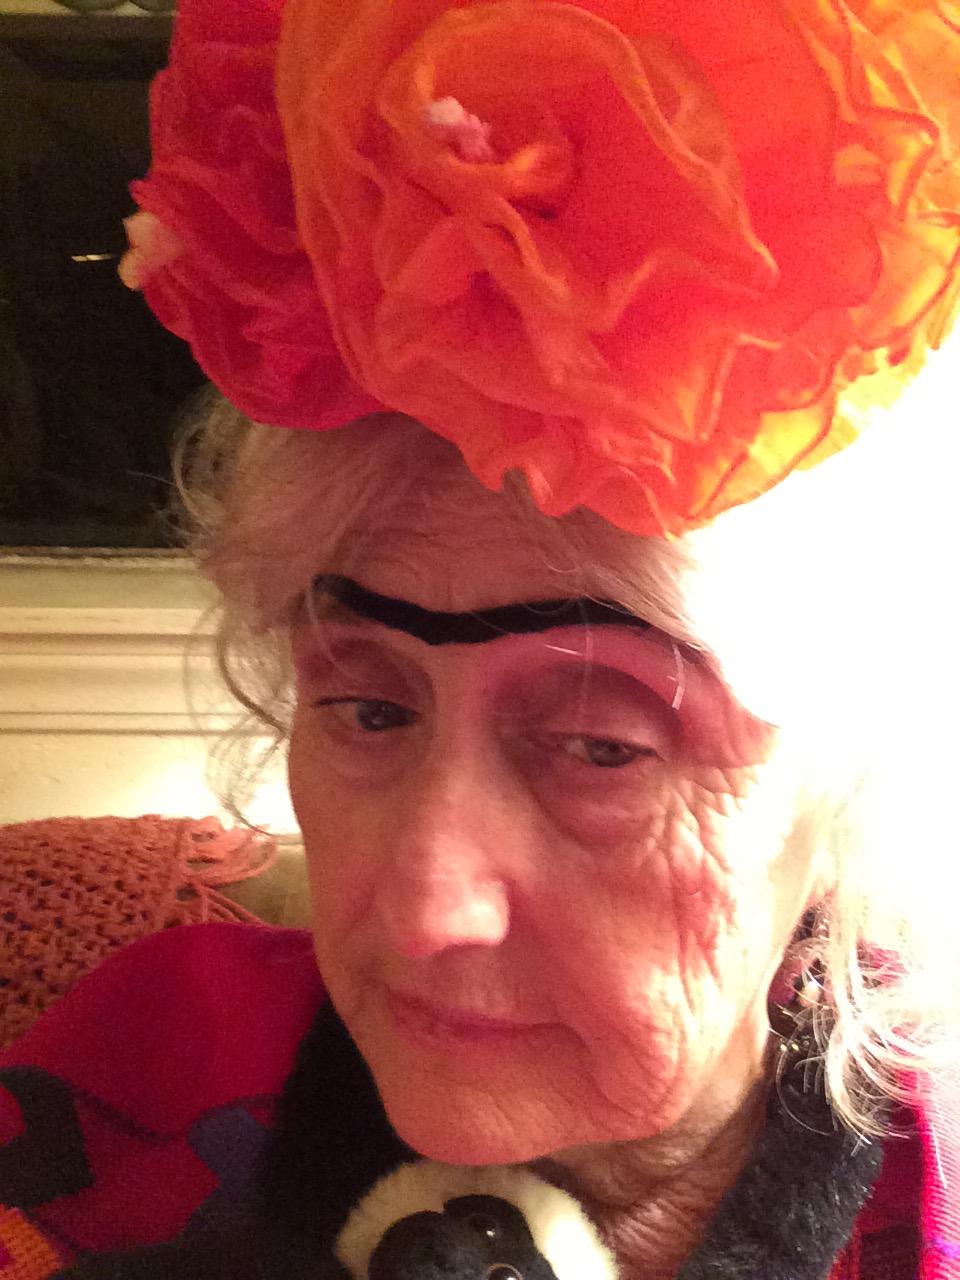 If Frida Kahlo had lived to 70